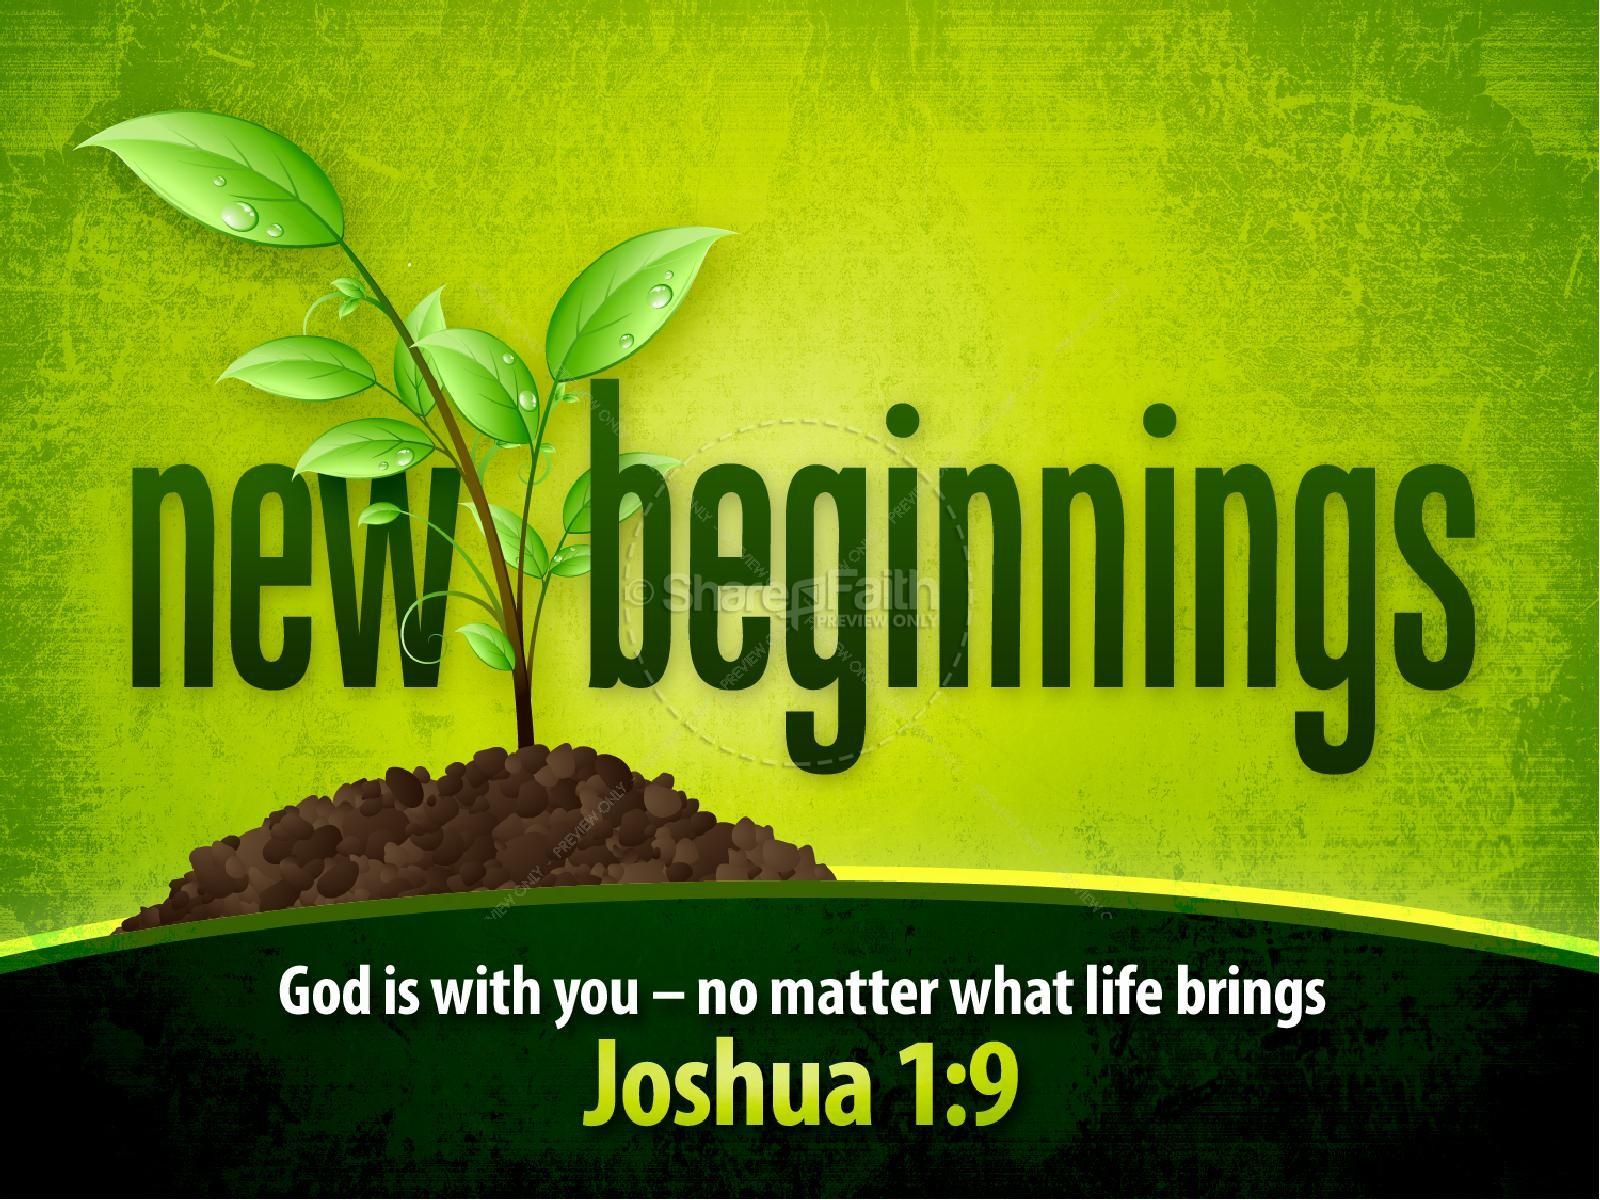 hight resolution of new year beginnings powerpoint sermon